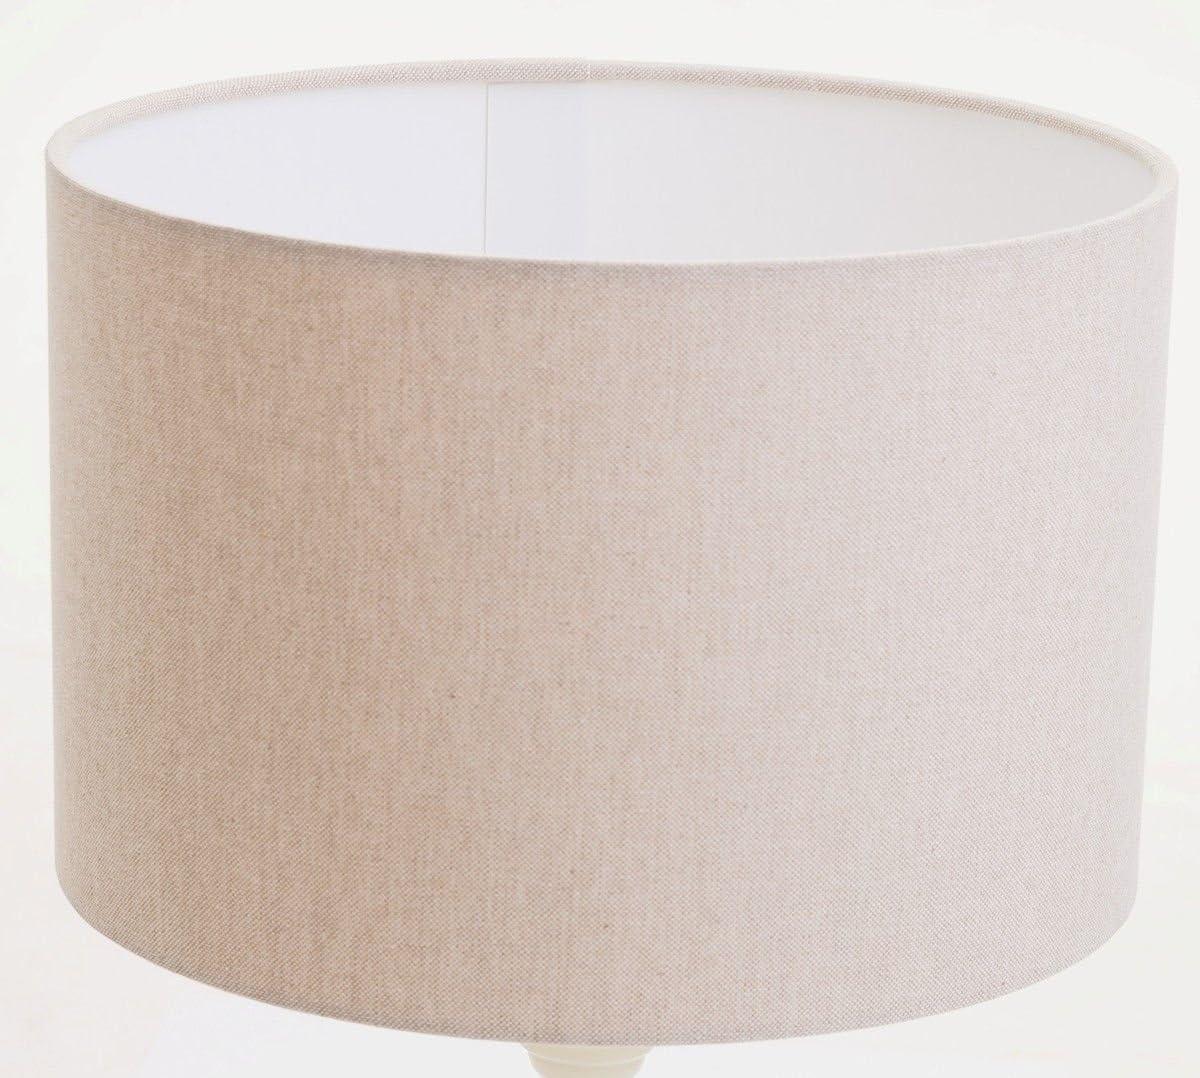 16 (40cm) Cream Linen Look Lamp Shade